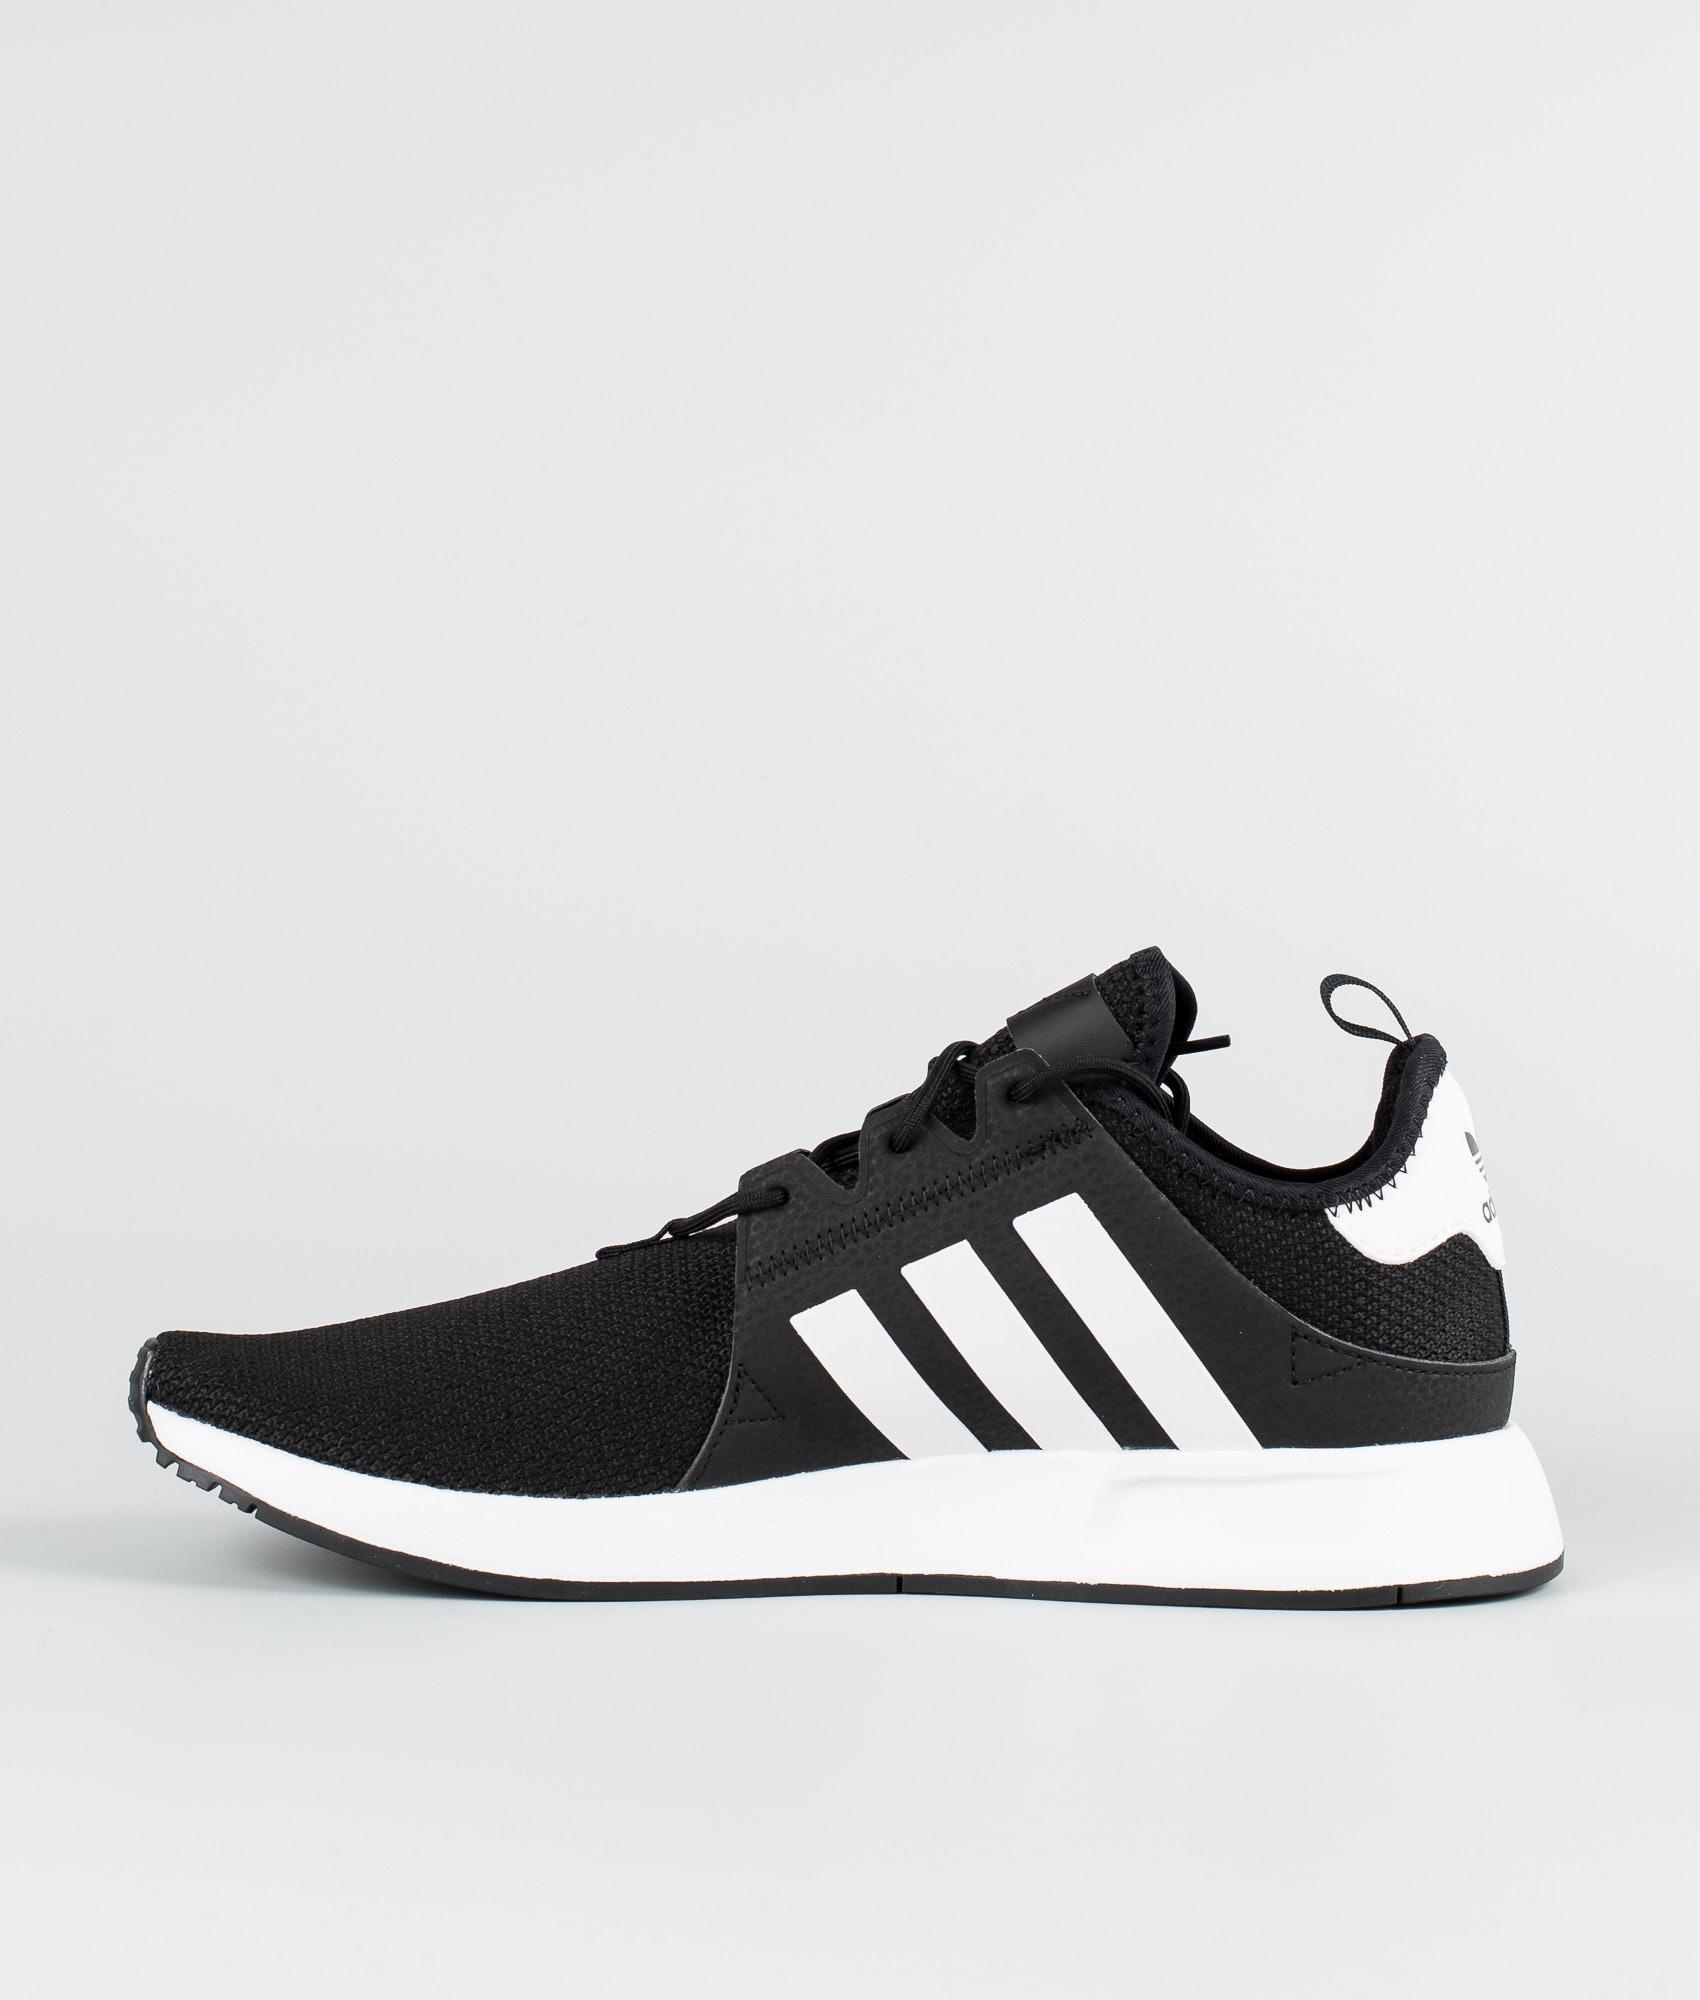 finest selection 39948 f1559 Adidas Originals X Plr Shoes